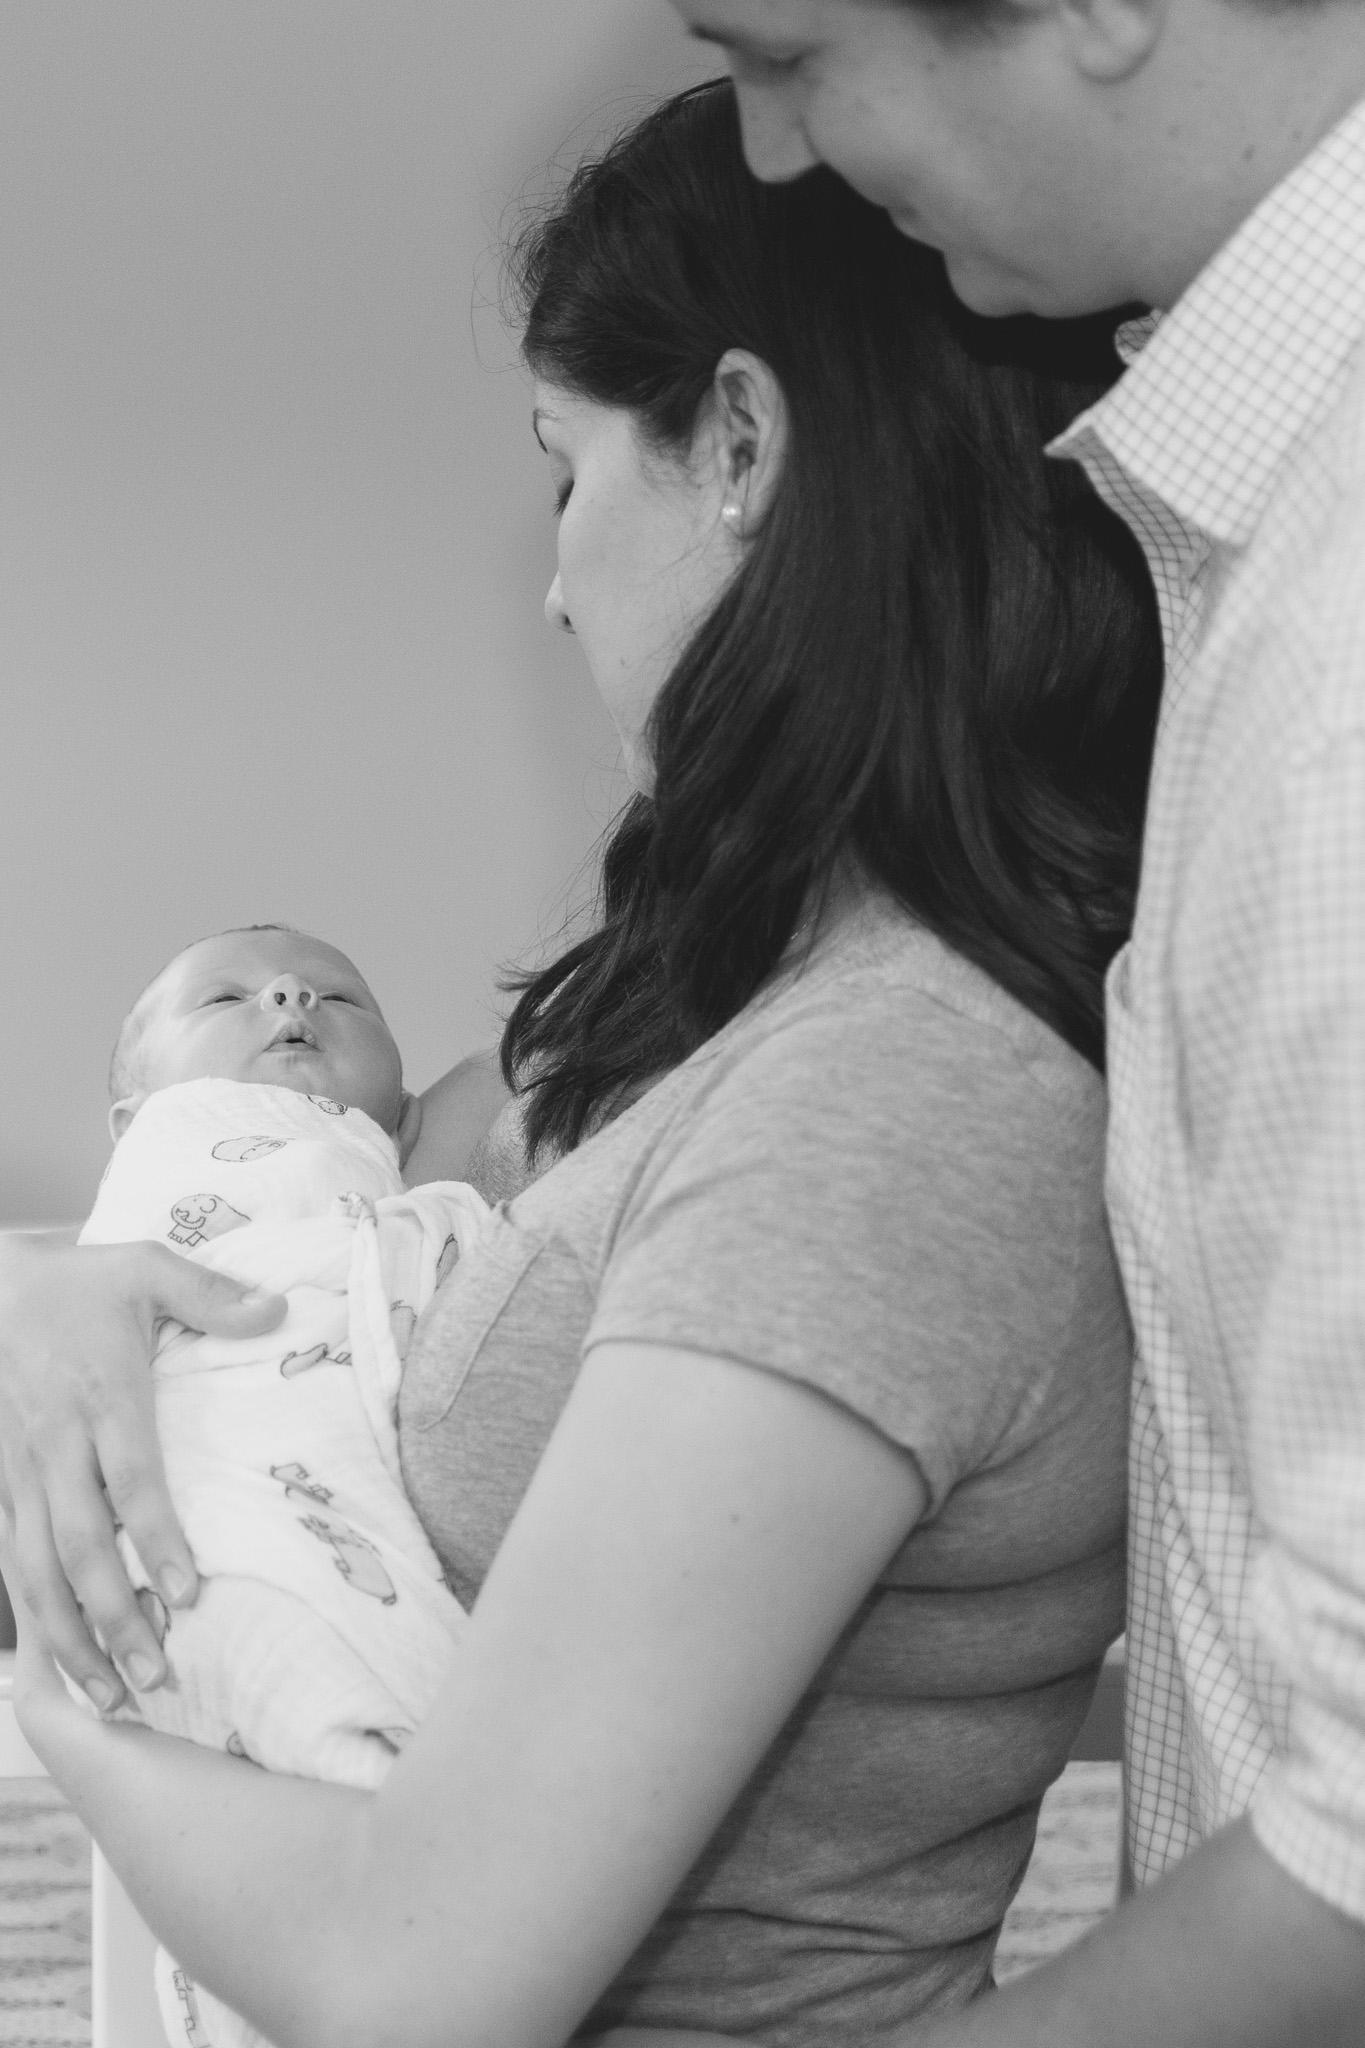 lifestyle_session_newborn_family_home_lynhcburg_va_photographers008.jpg